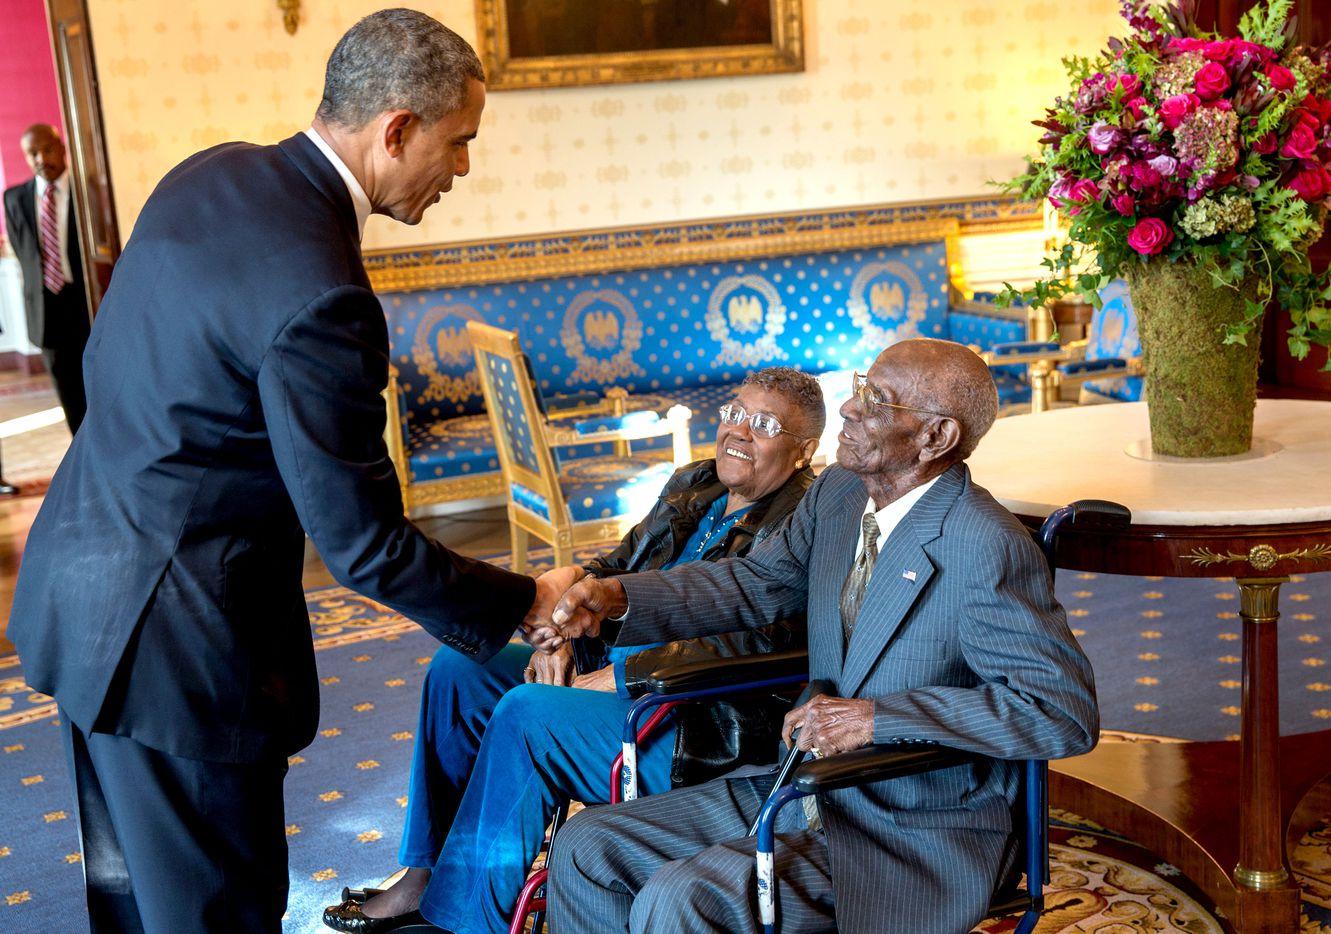 President Barack Obama greets Richard Overton, with Earlene Love-Karo, in the Blue Room of the White House, Nov. 11, 2013. Mr. Overton was attending the Veteran's Day Breakfast at the White House. (Lawrence Jackson/The White House)